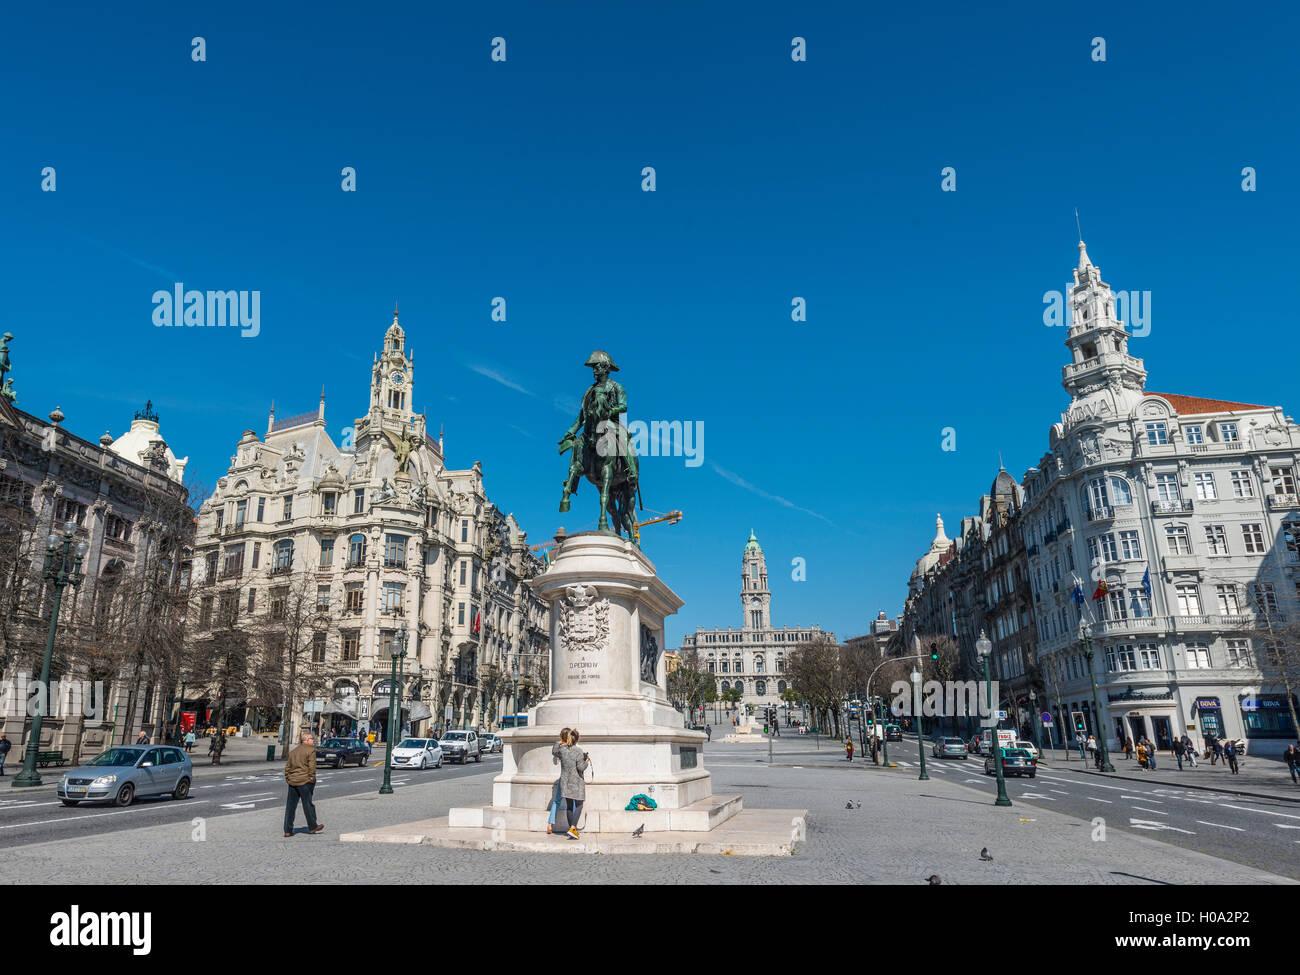 Reiterstandbild von Dom Pedro IV., der Avenida dos Aliados Avenue und Rathaus, Porto, Porto, Portugal Stockbild